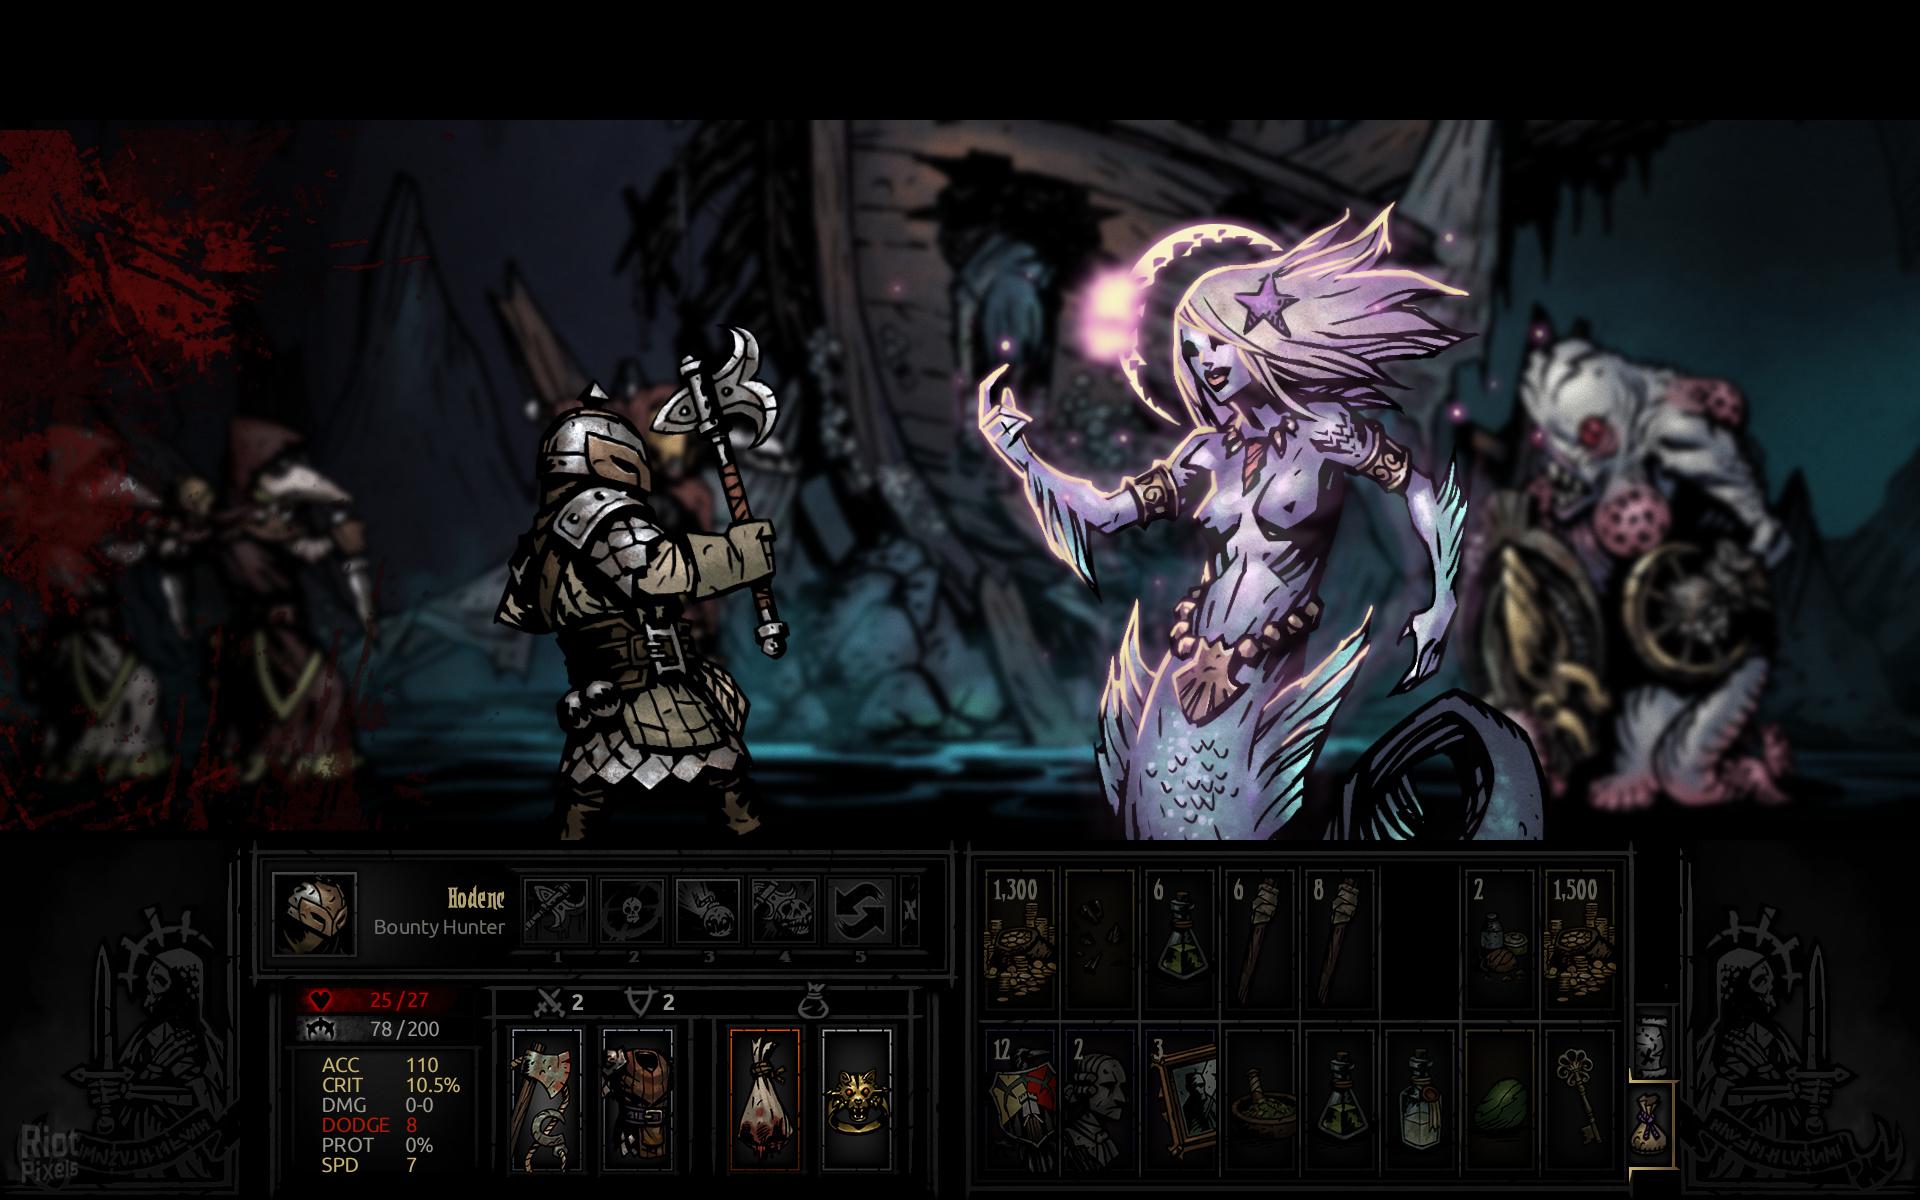 Darkest dungeon как надеть артефакт